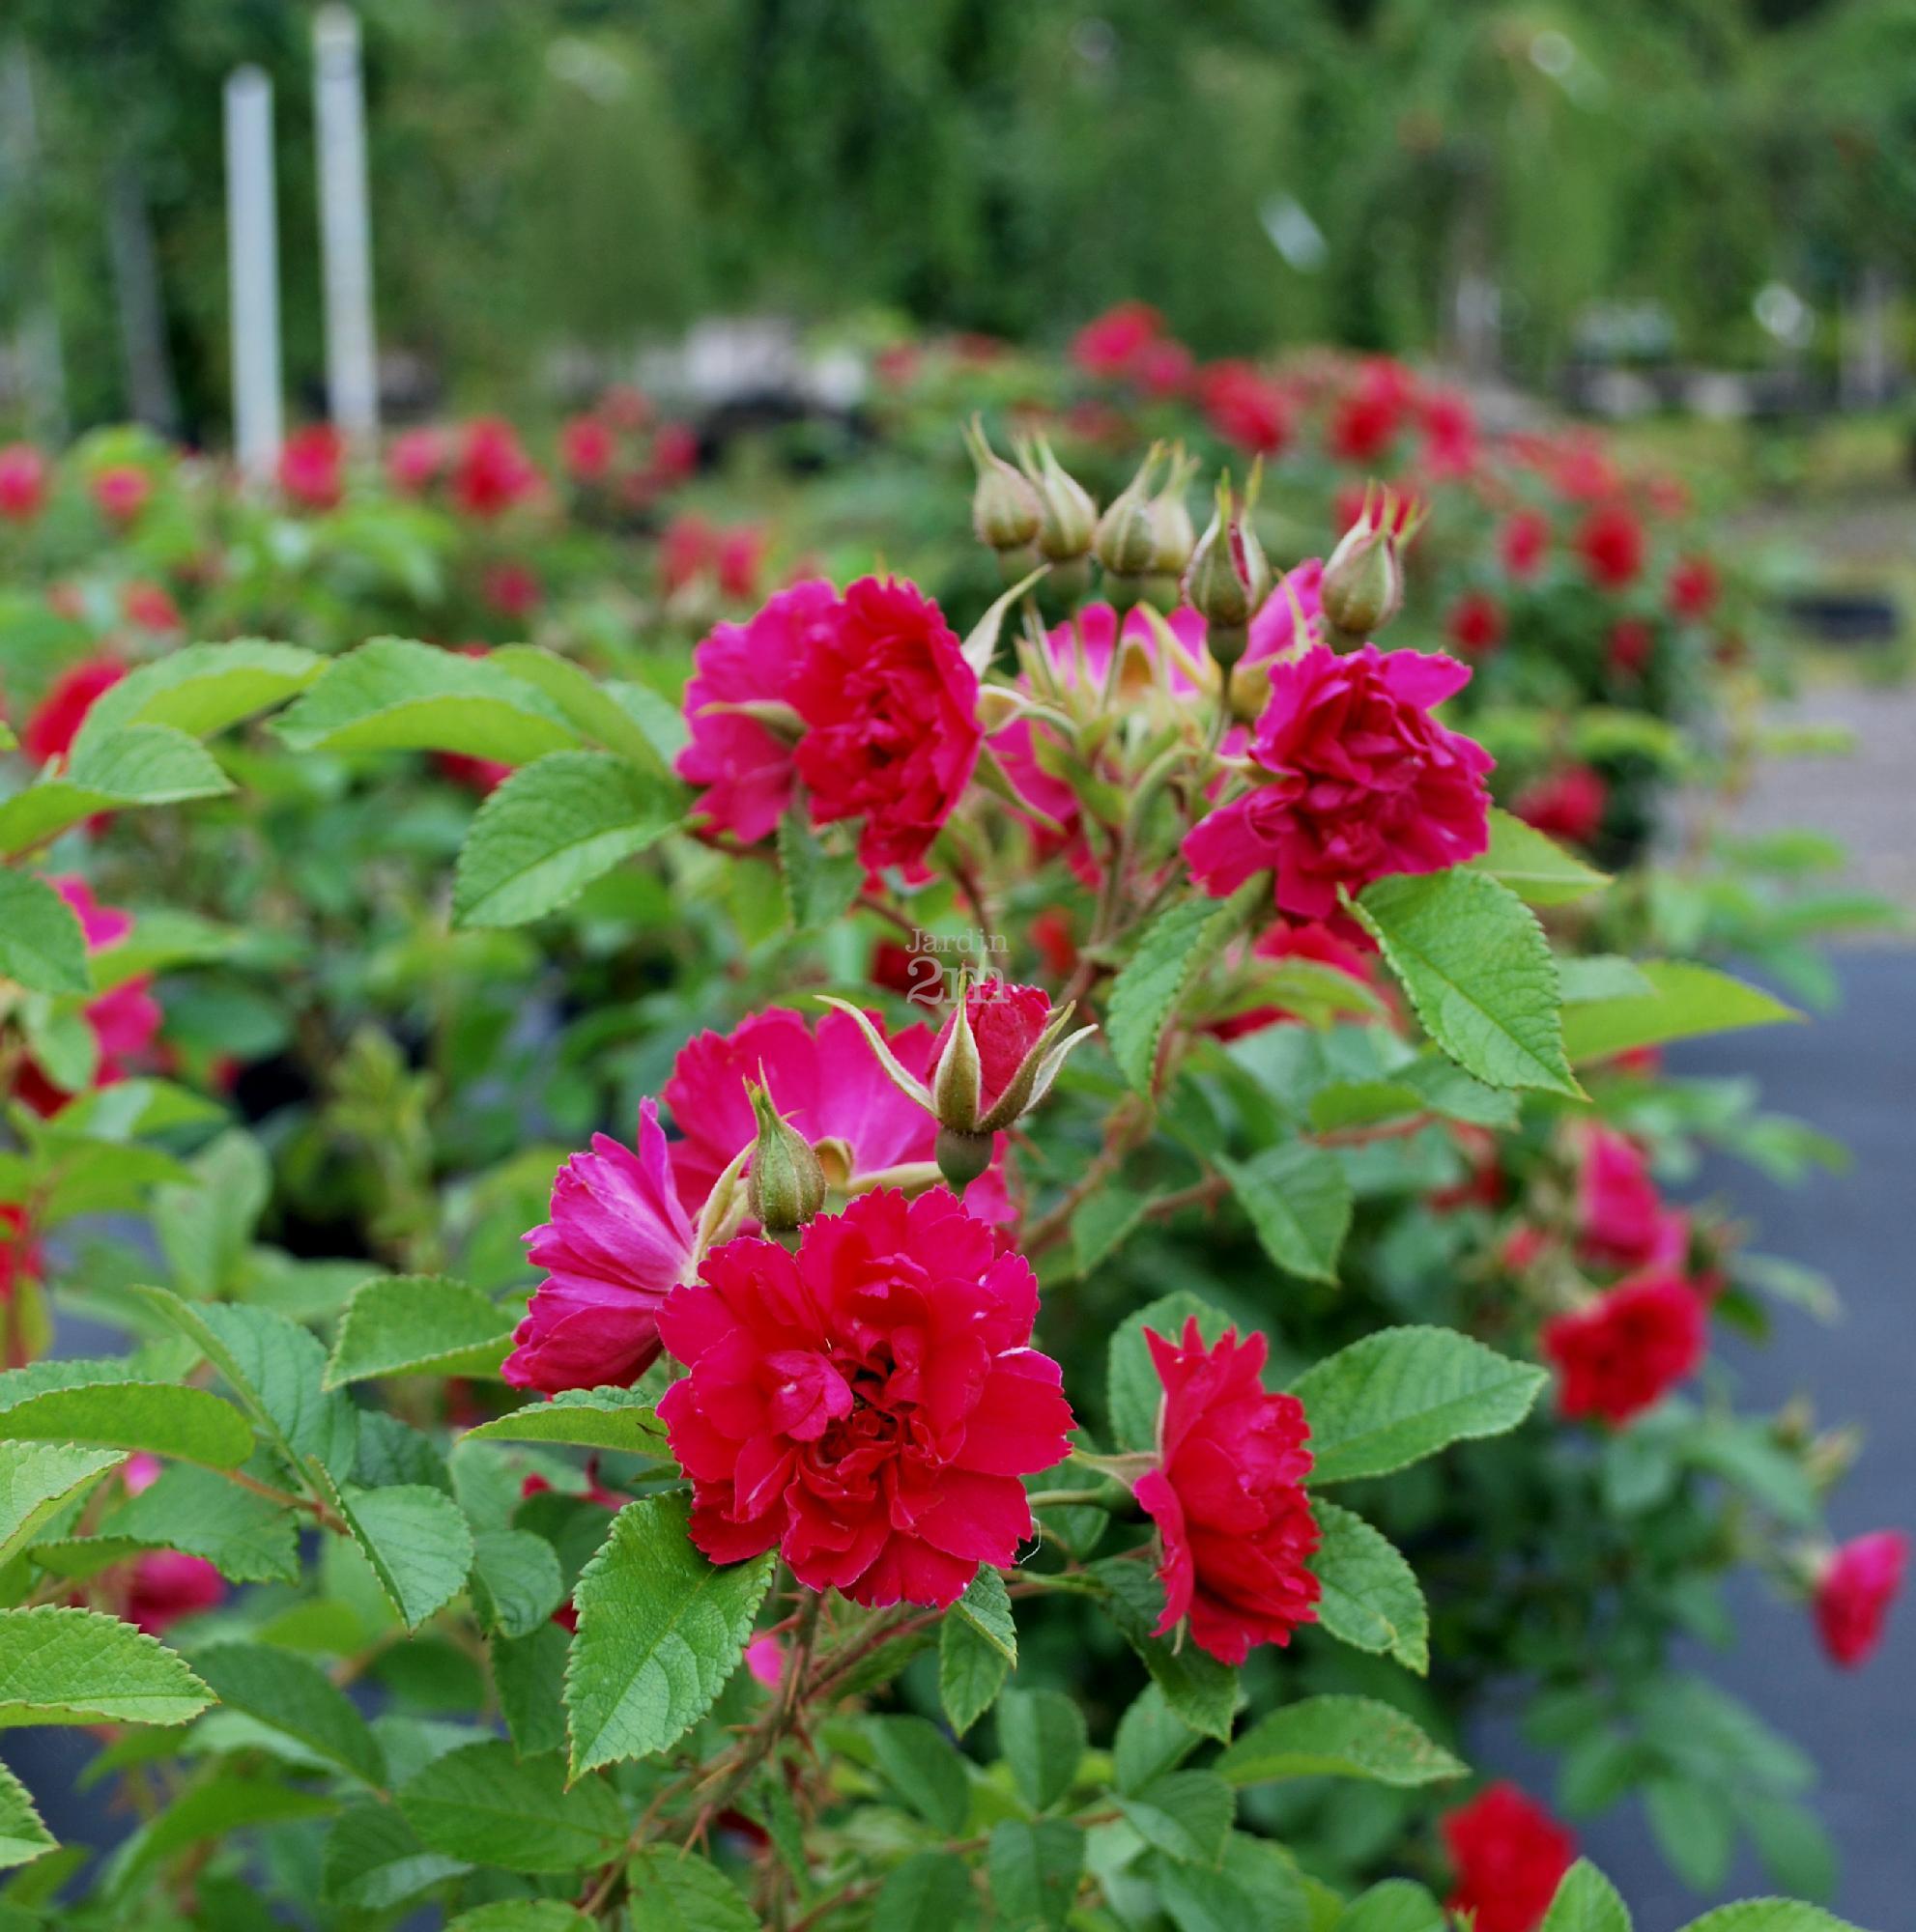 Rosa rugosa fj grootendorst rosier rustique rose nos v g taux jardin2m - Comment multiplier un rosier ...